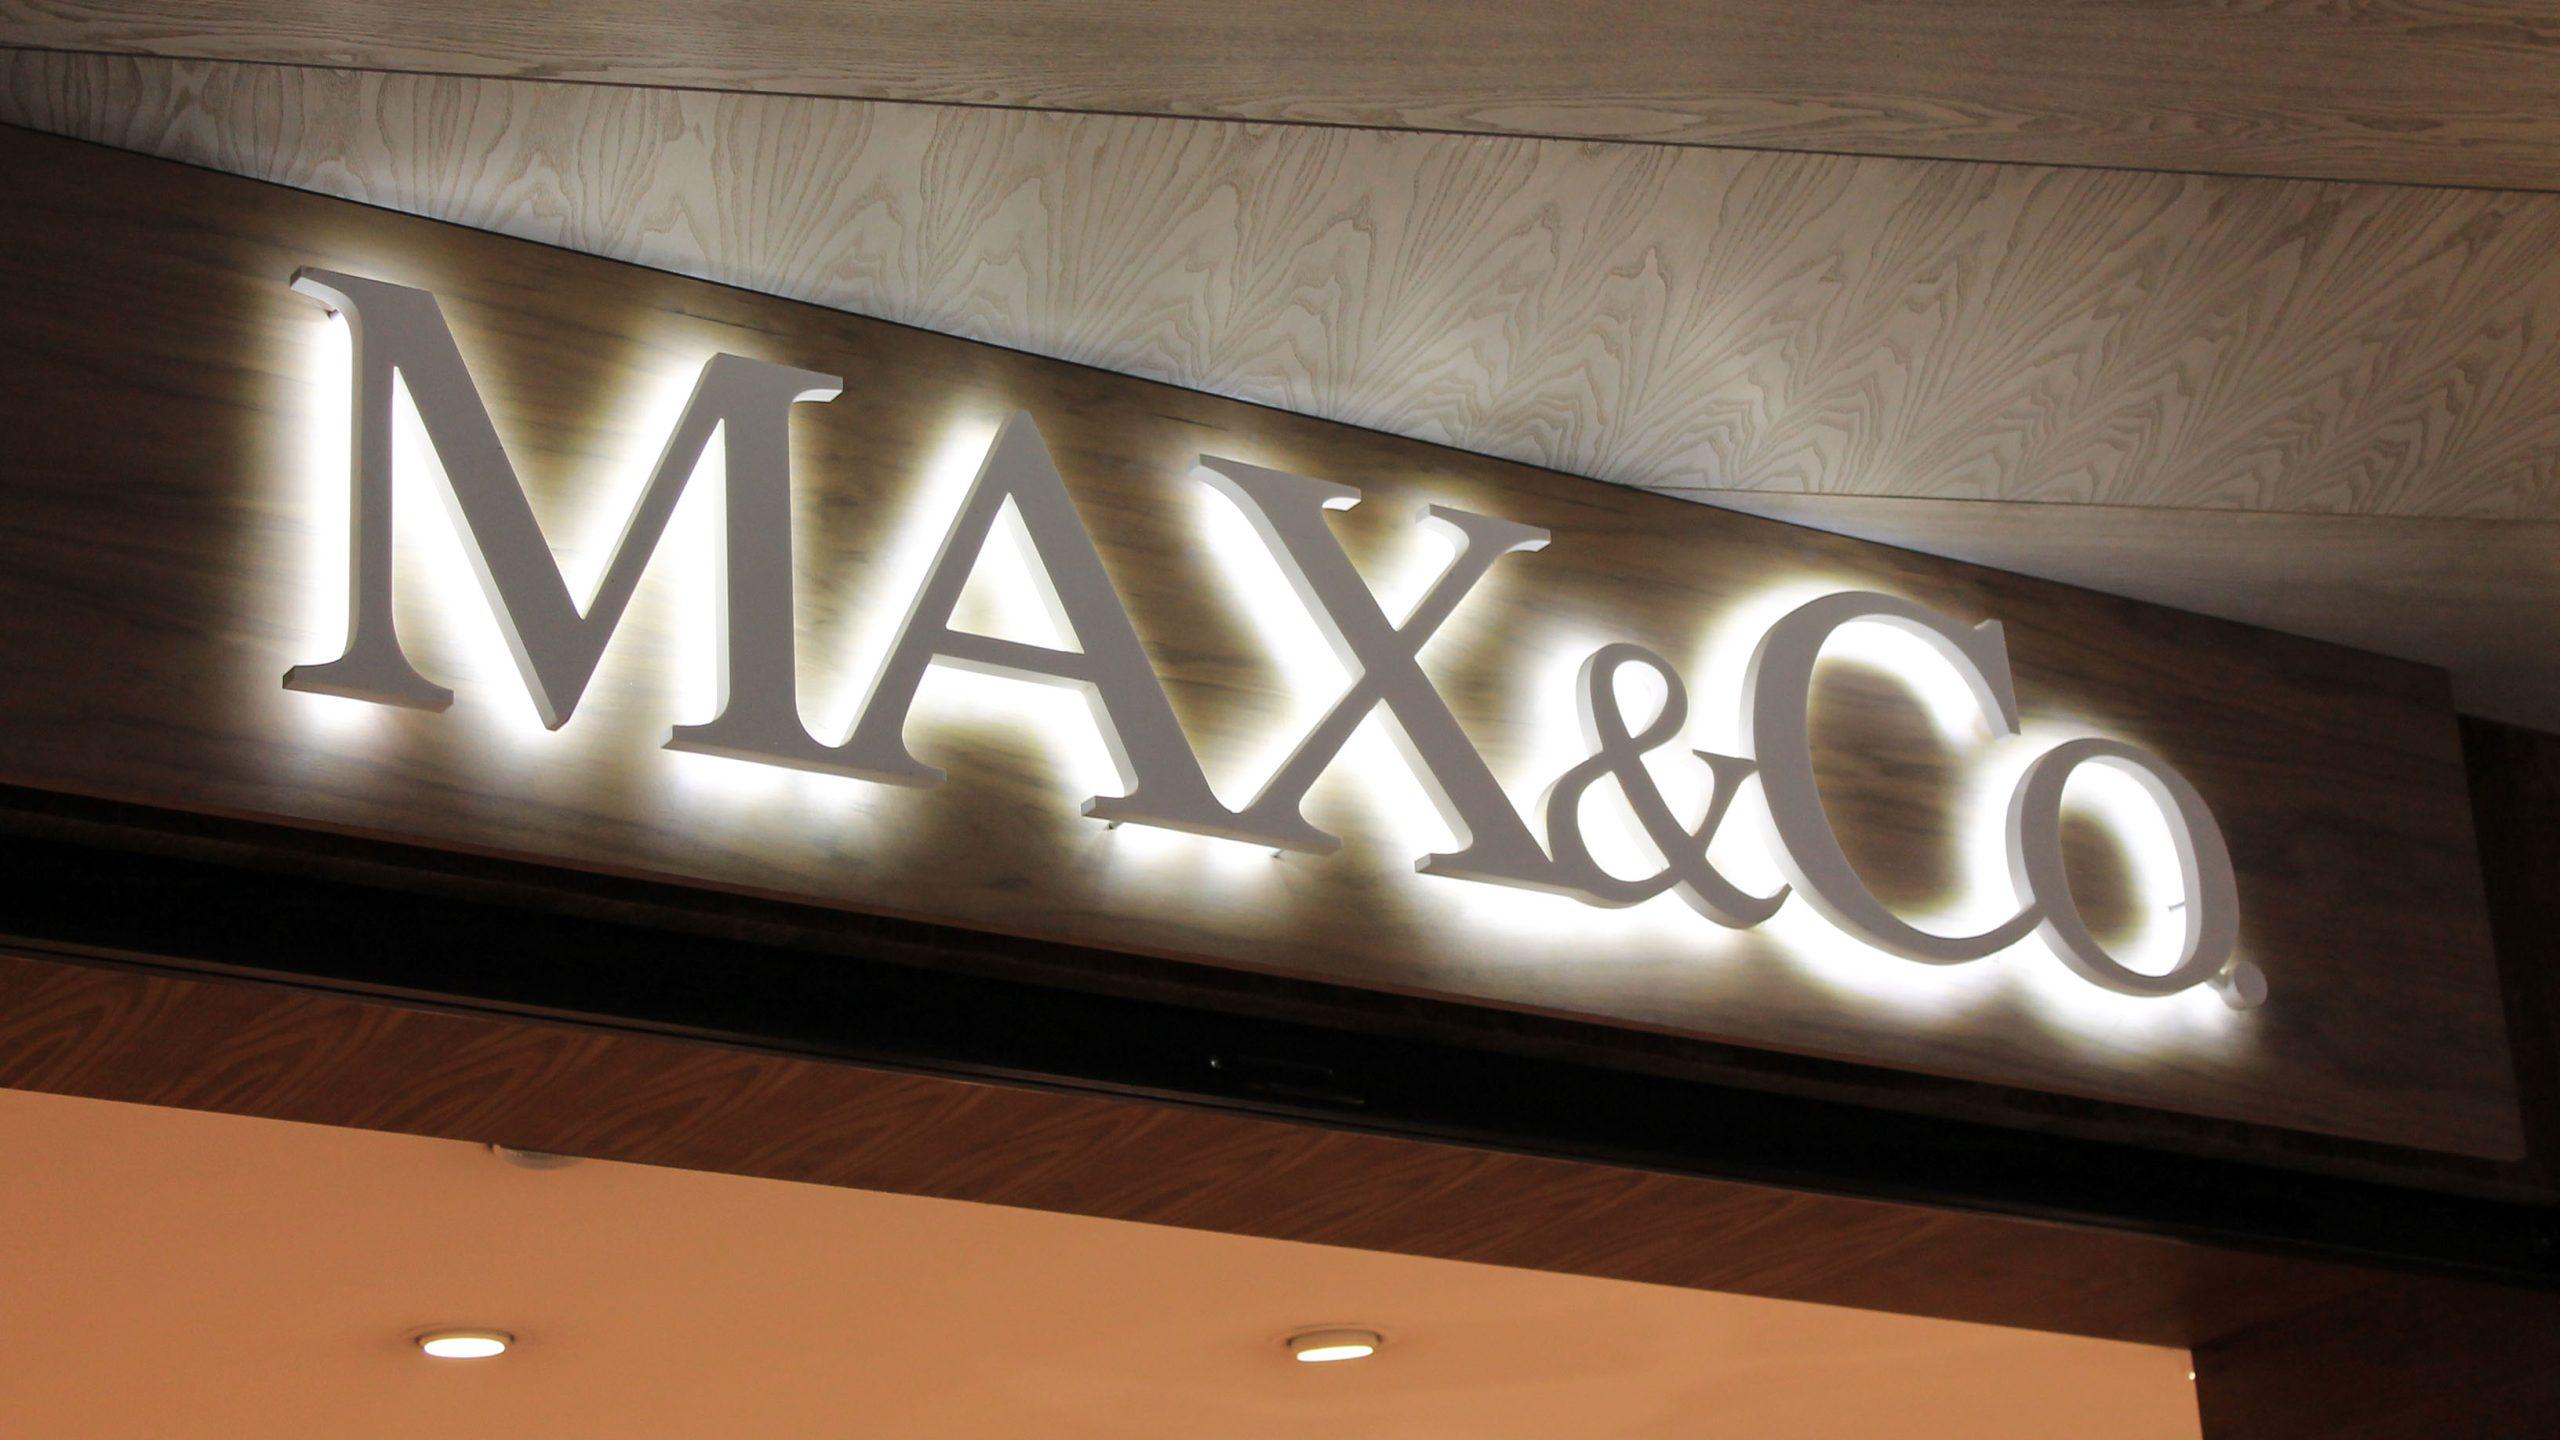 MAX CO LED reklama